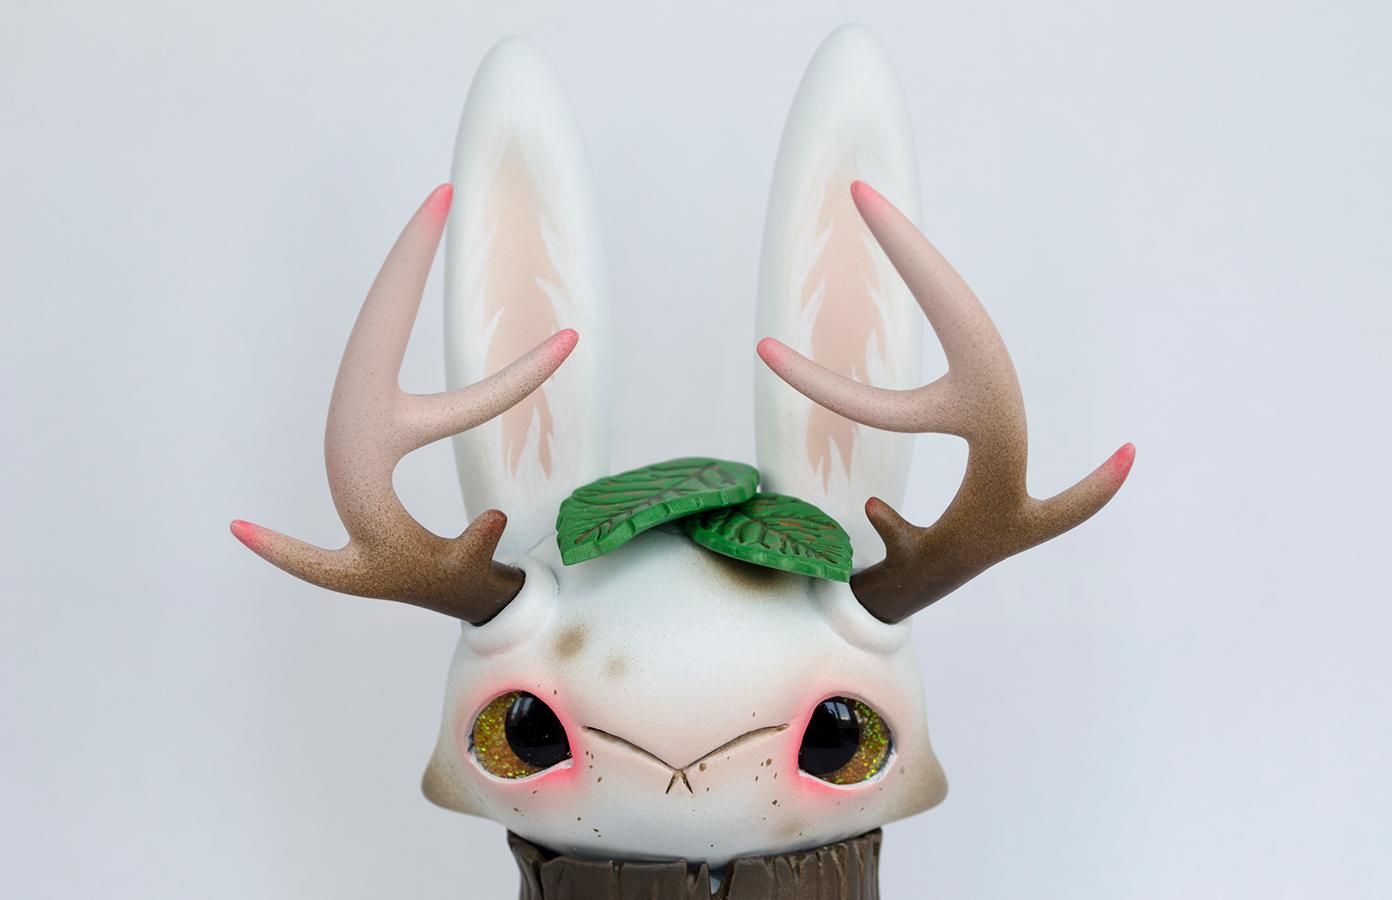 tomodachiisland_clutter_gallery_bedtime_bunny.jpg